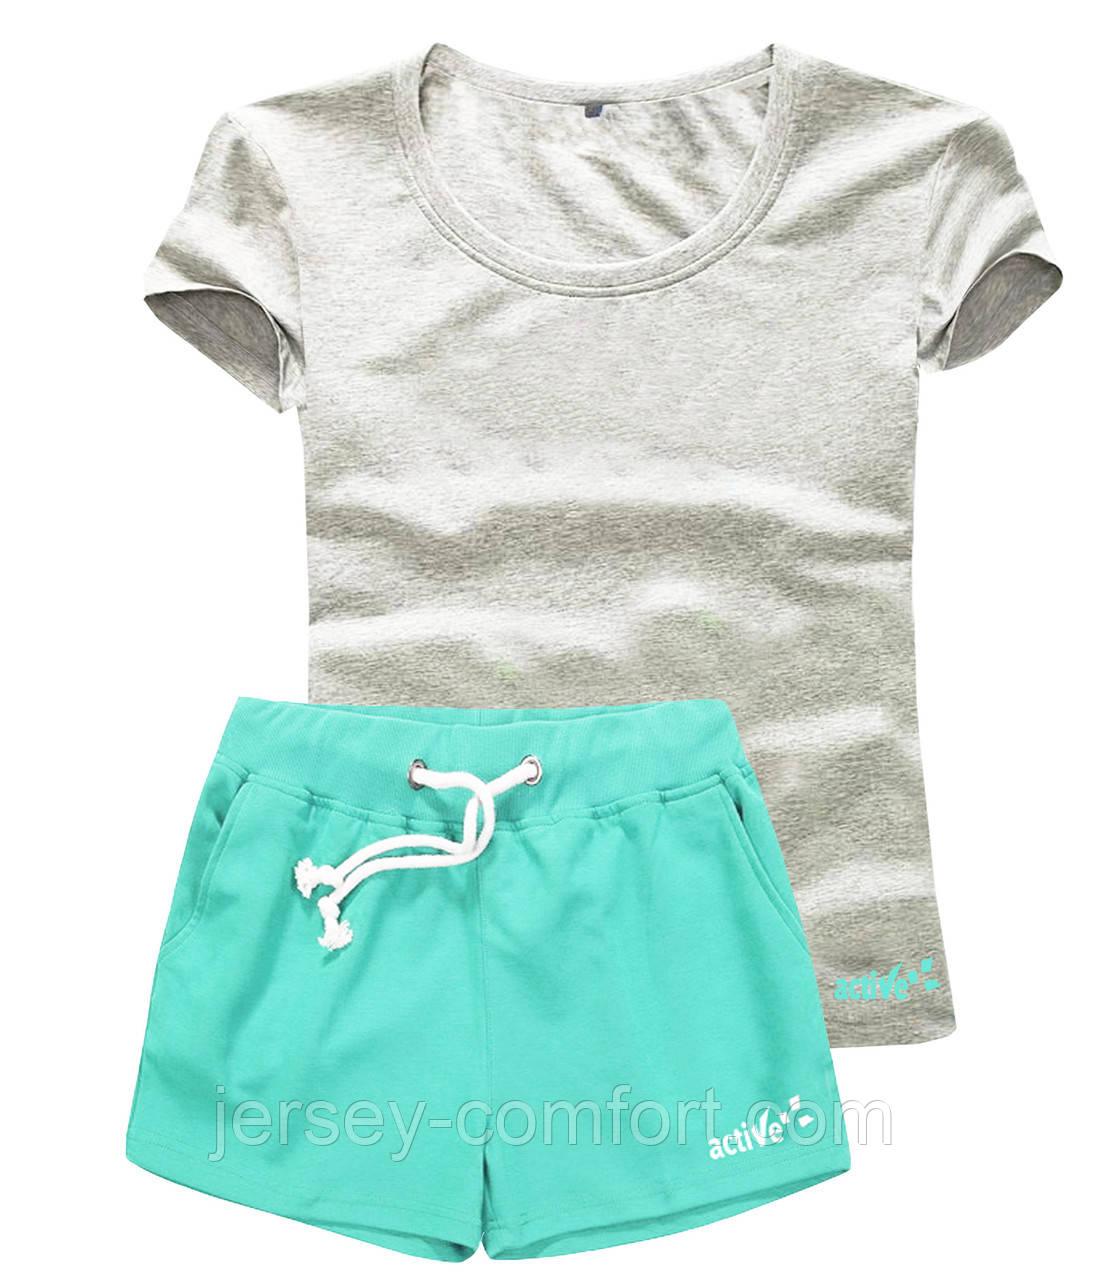 Женские шорты и футболка, комплект. Размеры 40-56.Мод. М-28..